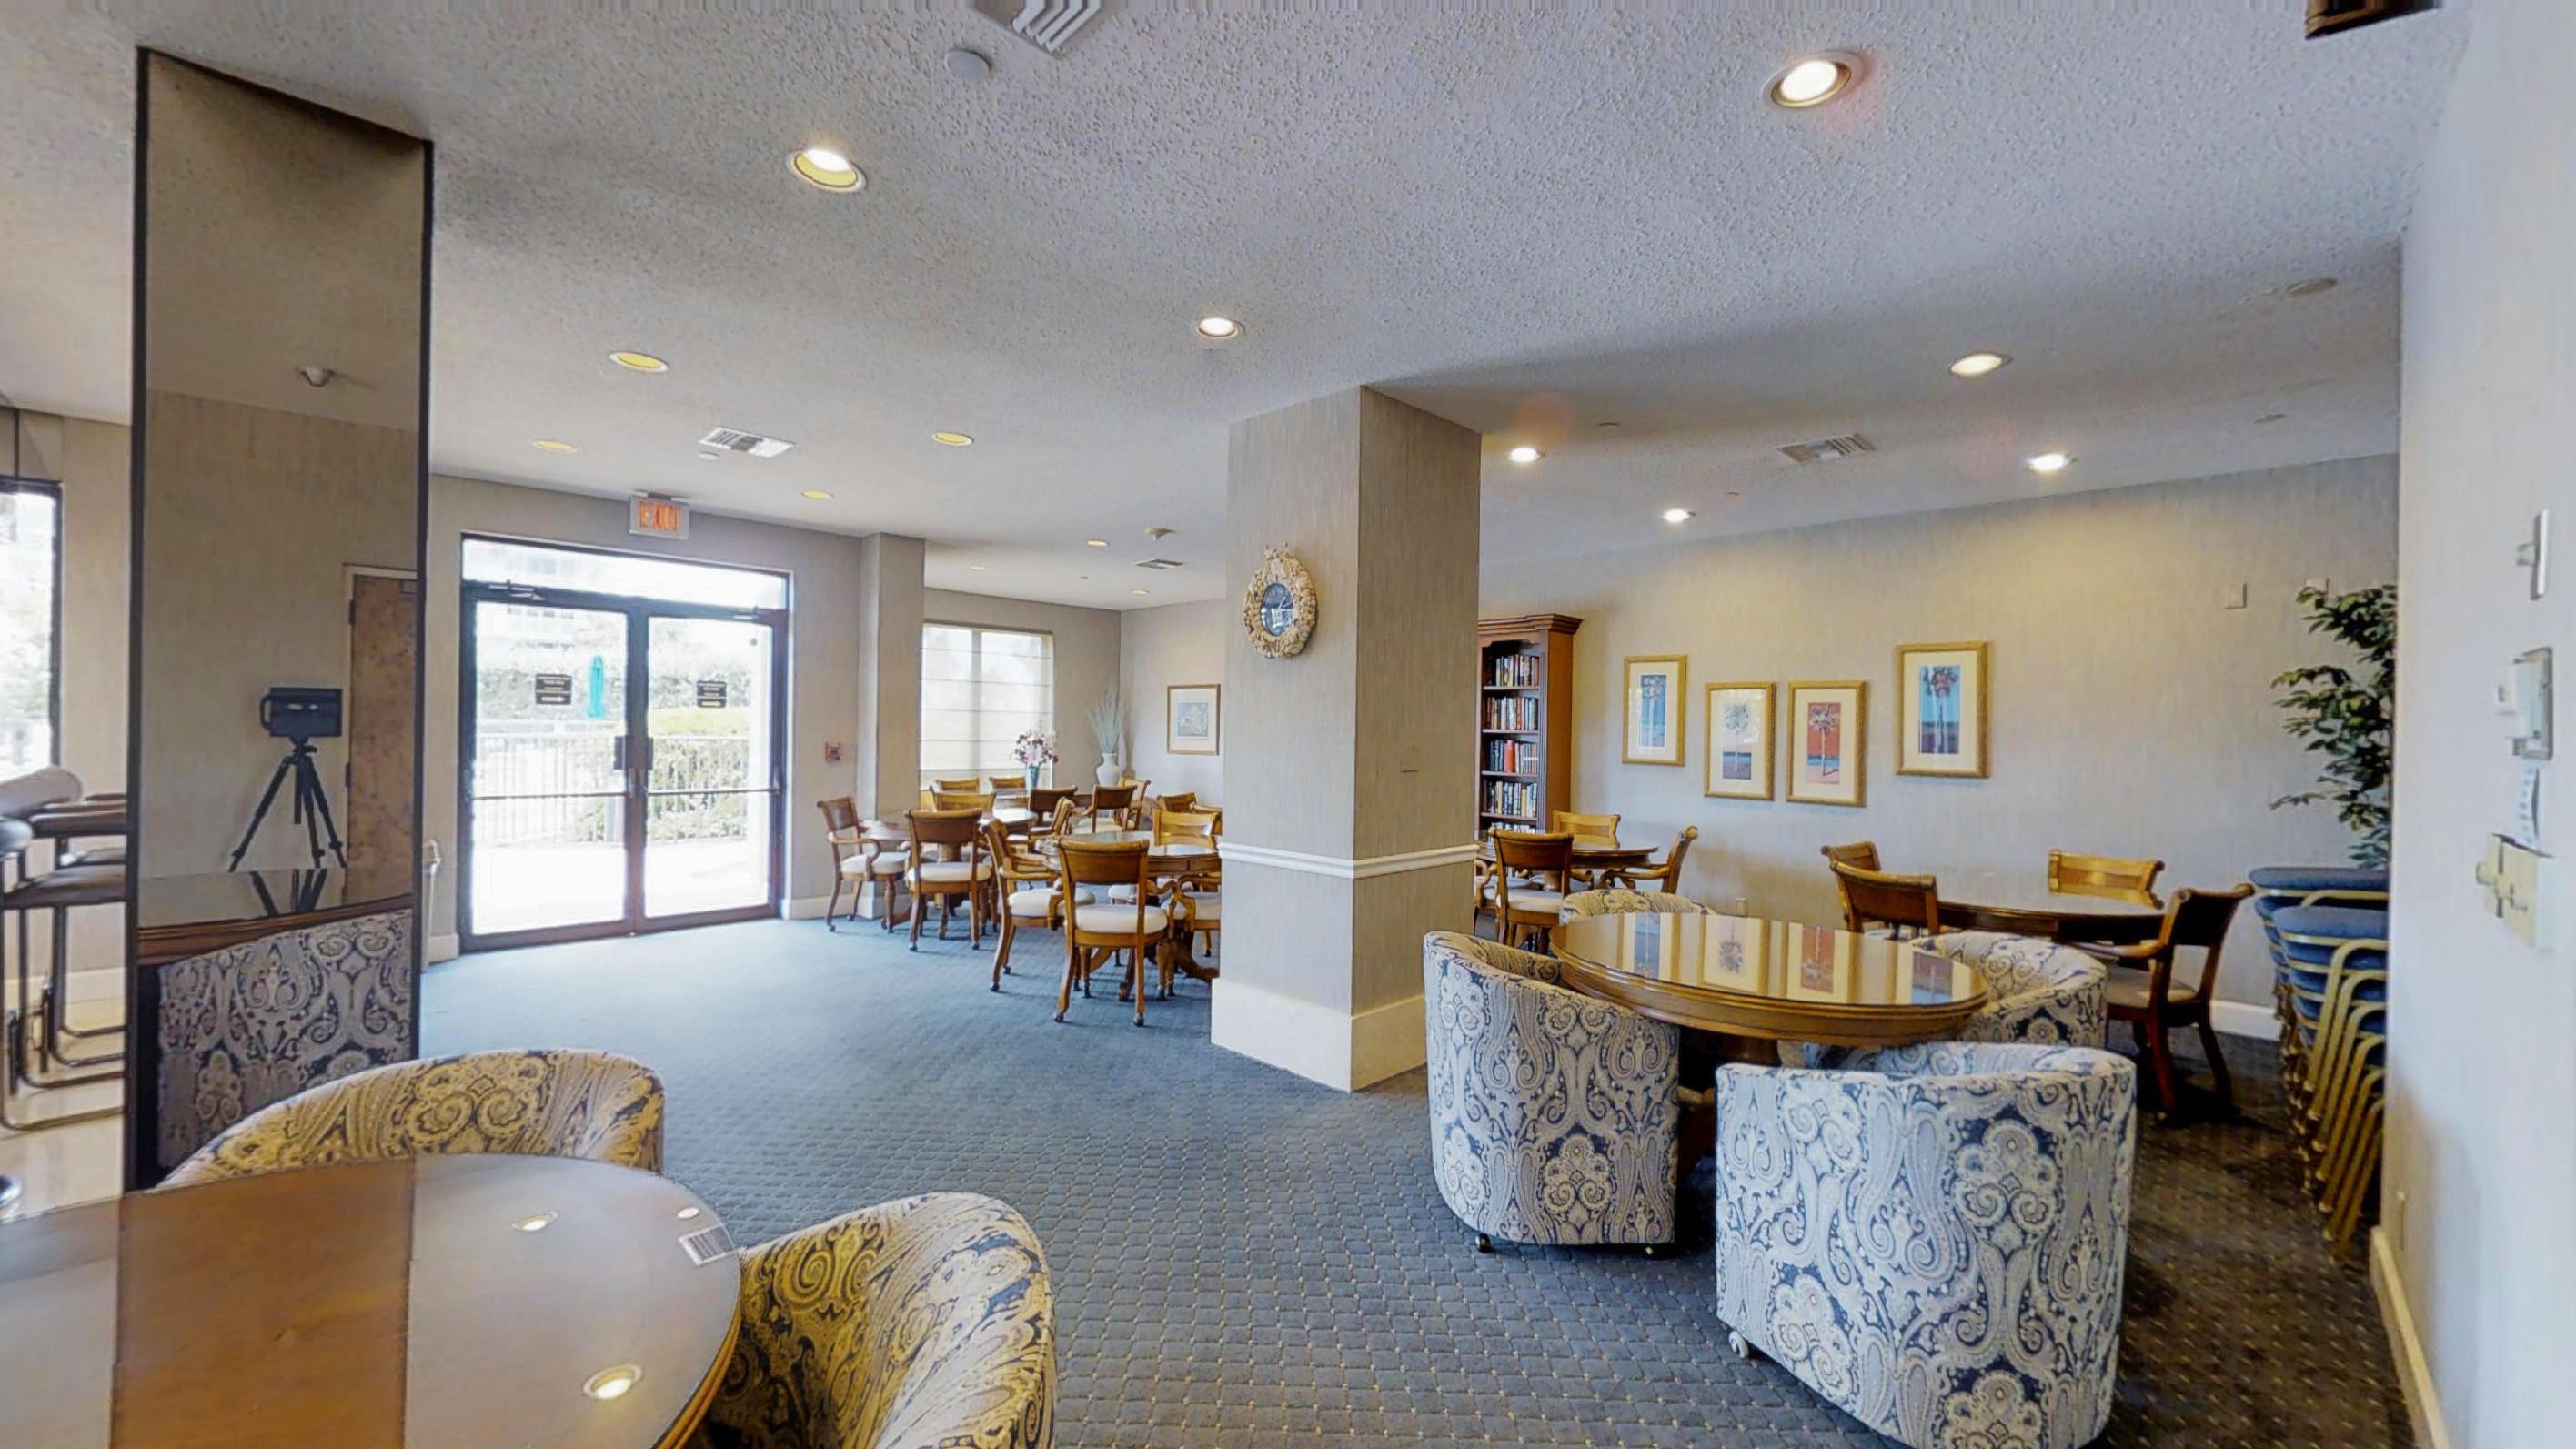 2800_Barclay Club Room(32)